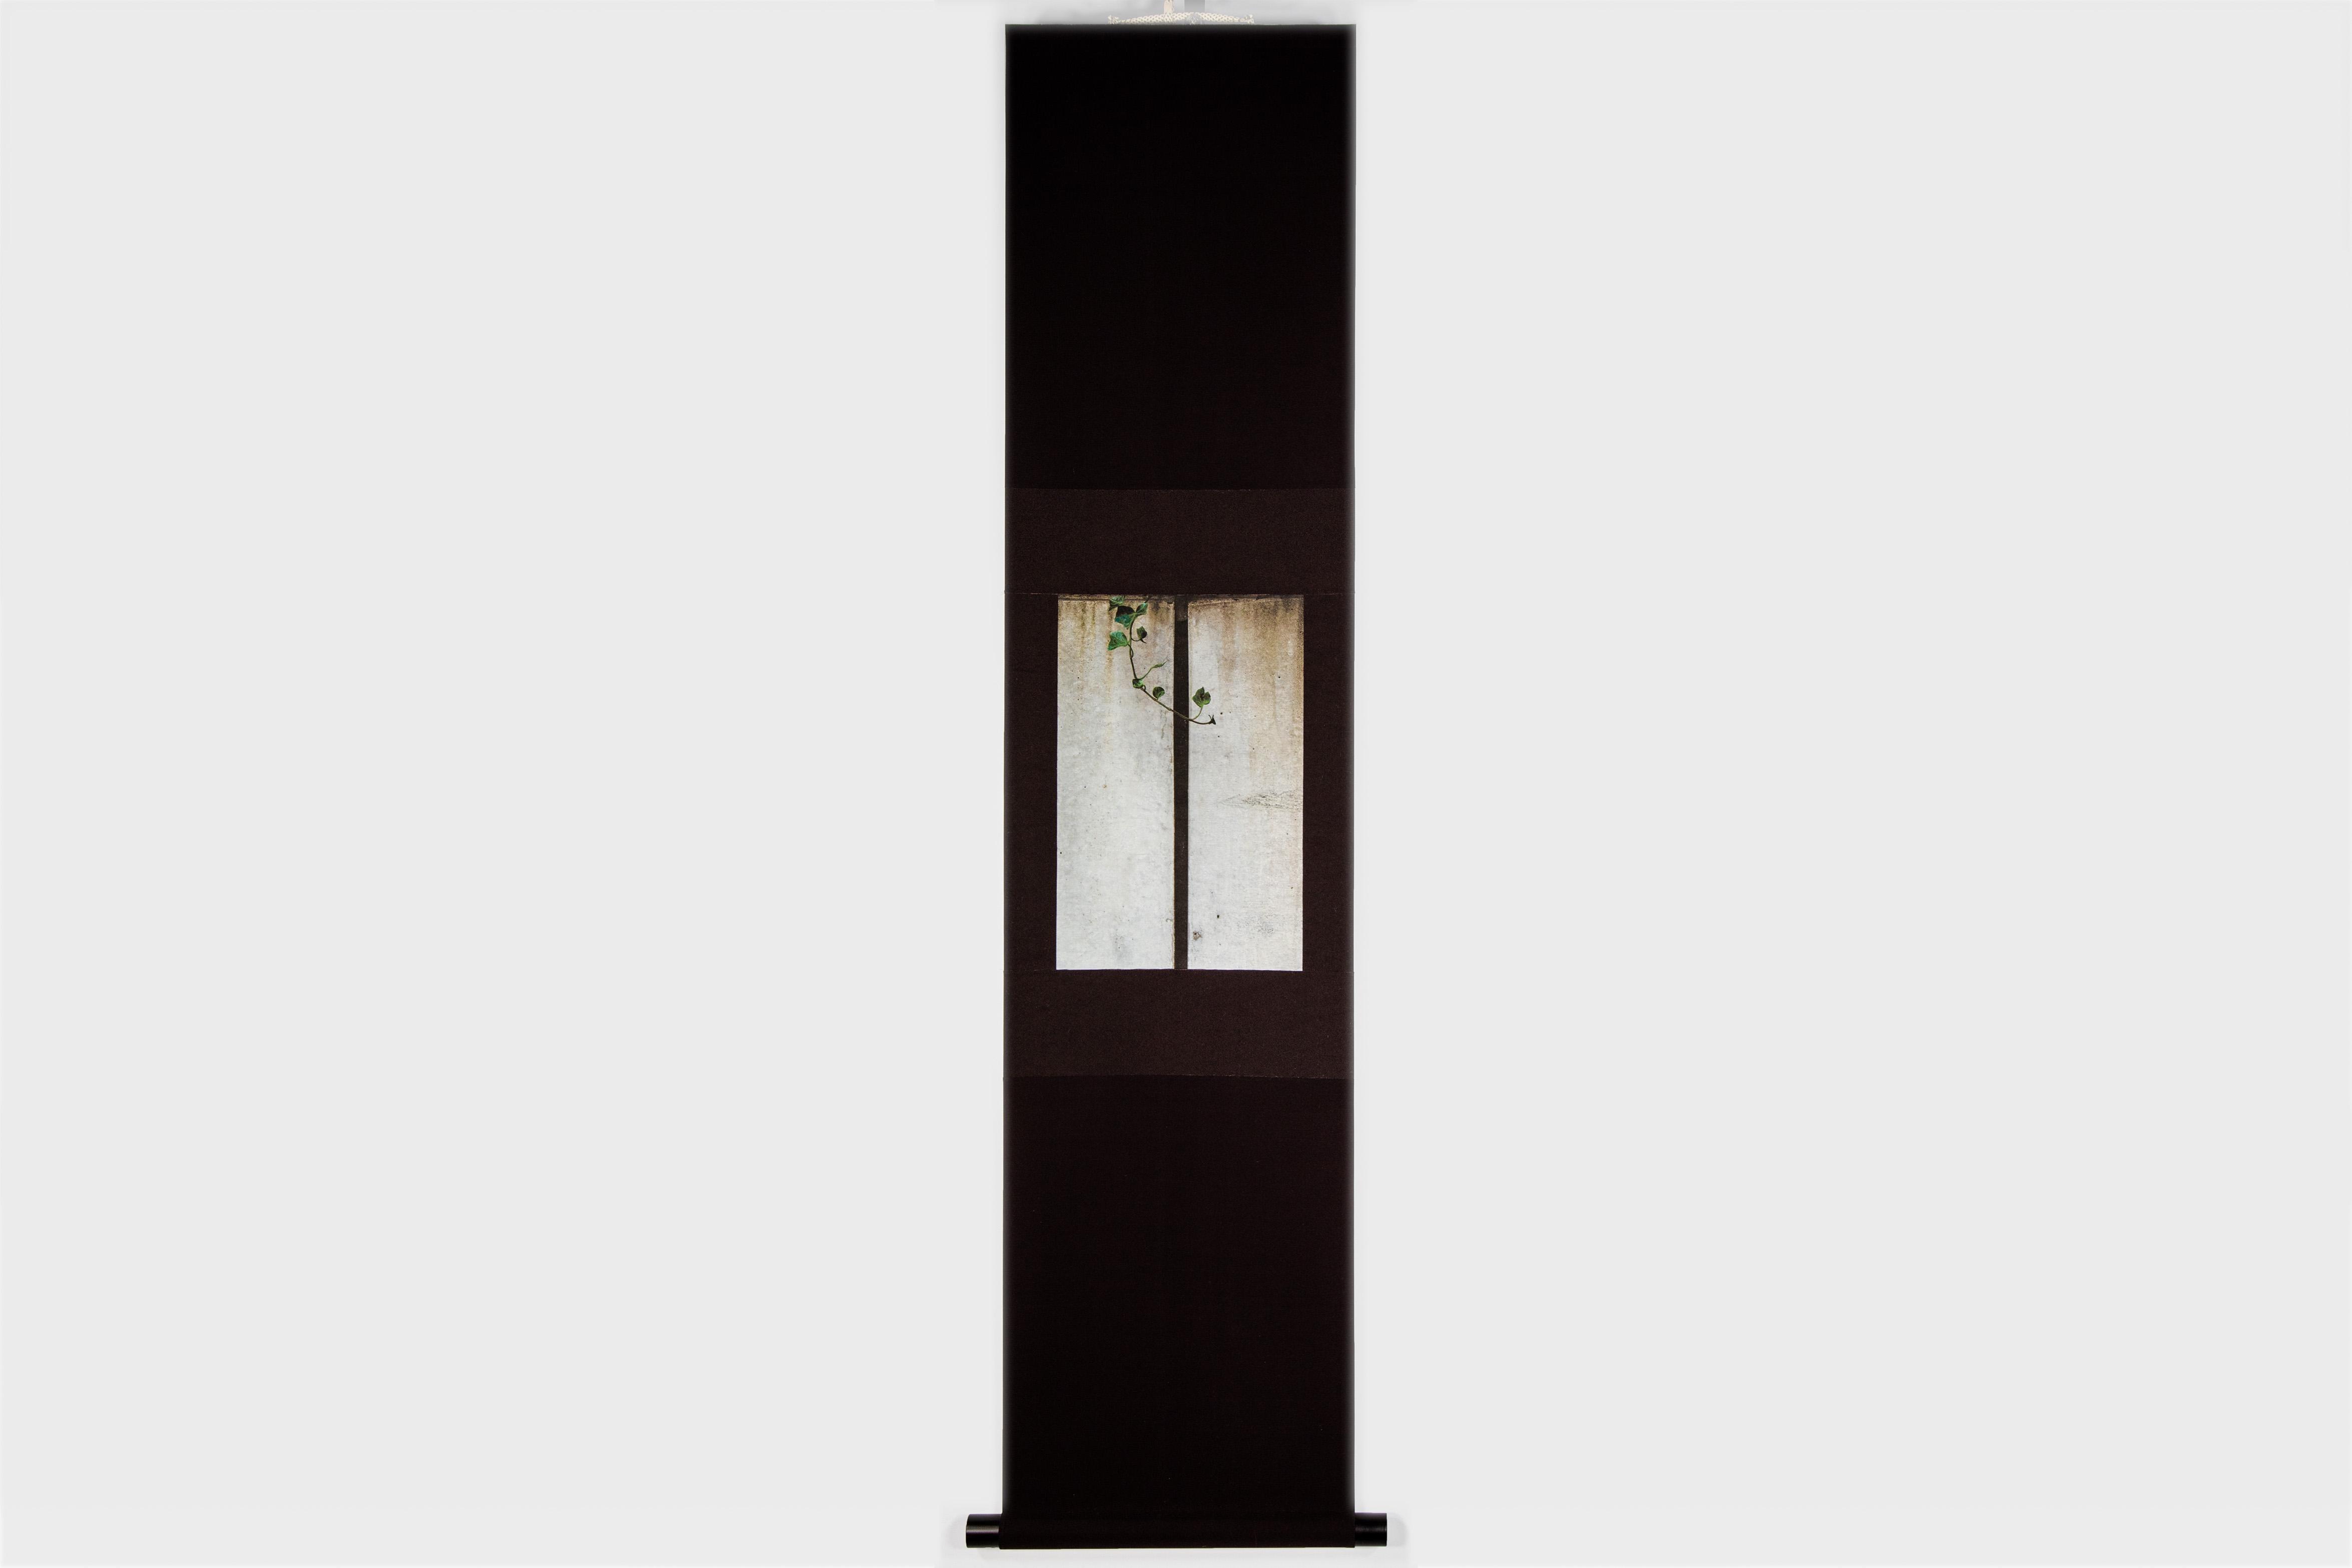 Japanese Contemporary Art by Kojun - Kensho 2246